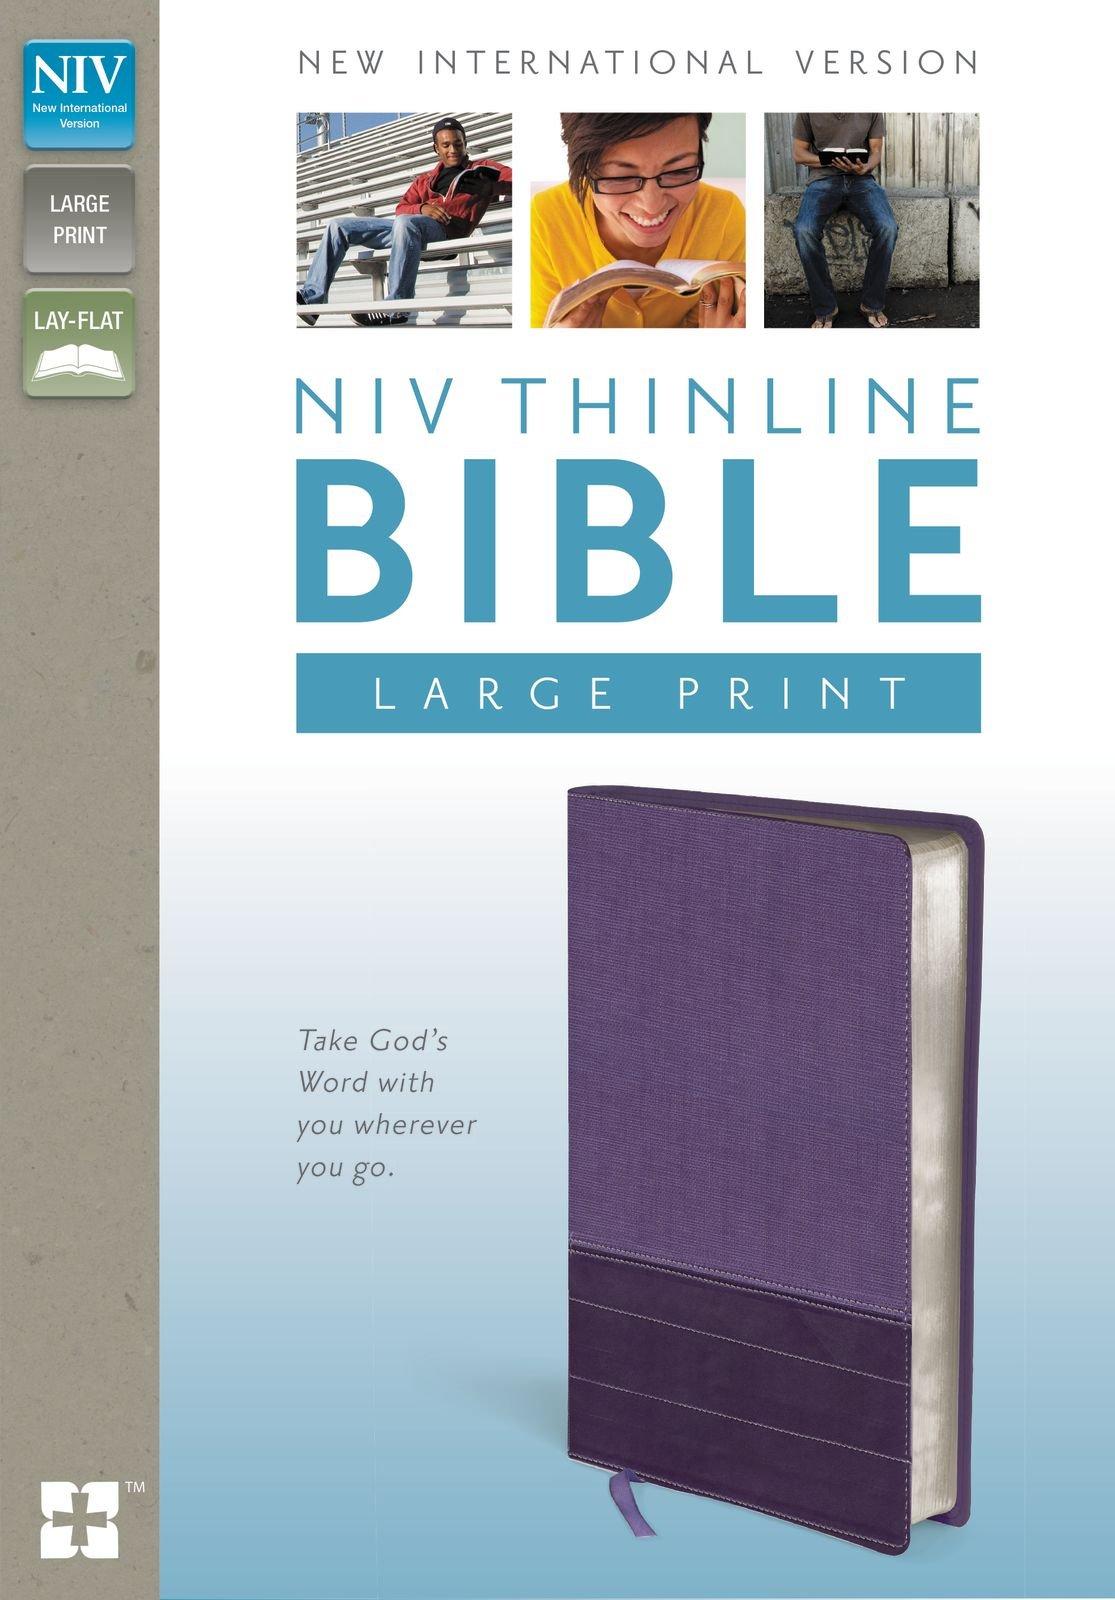 NIV, Thinline Bible, Large Print, Imitation Leather, Purple, Red Letter  Edition: Zondervan: 0025986435998: Amazon.com: Books